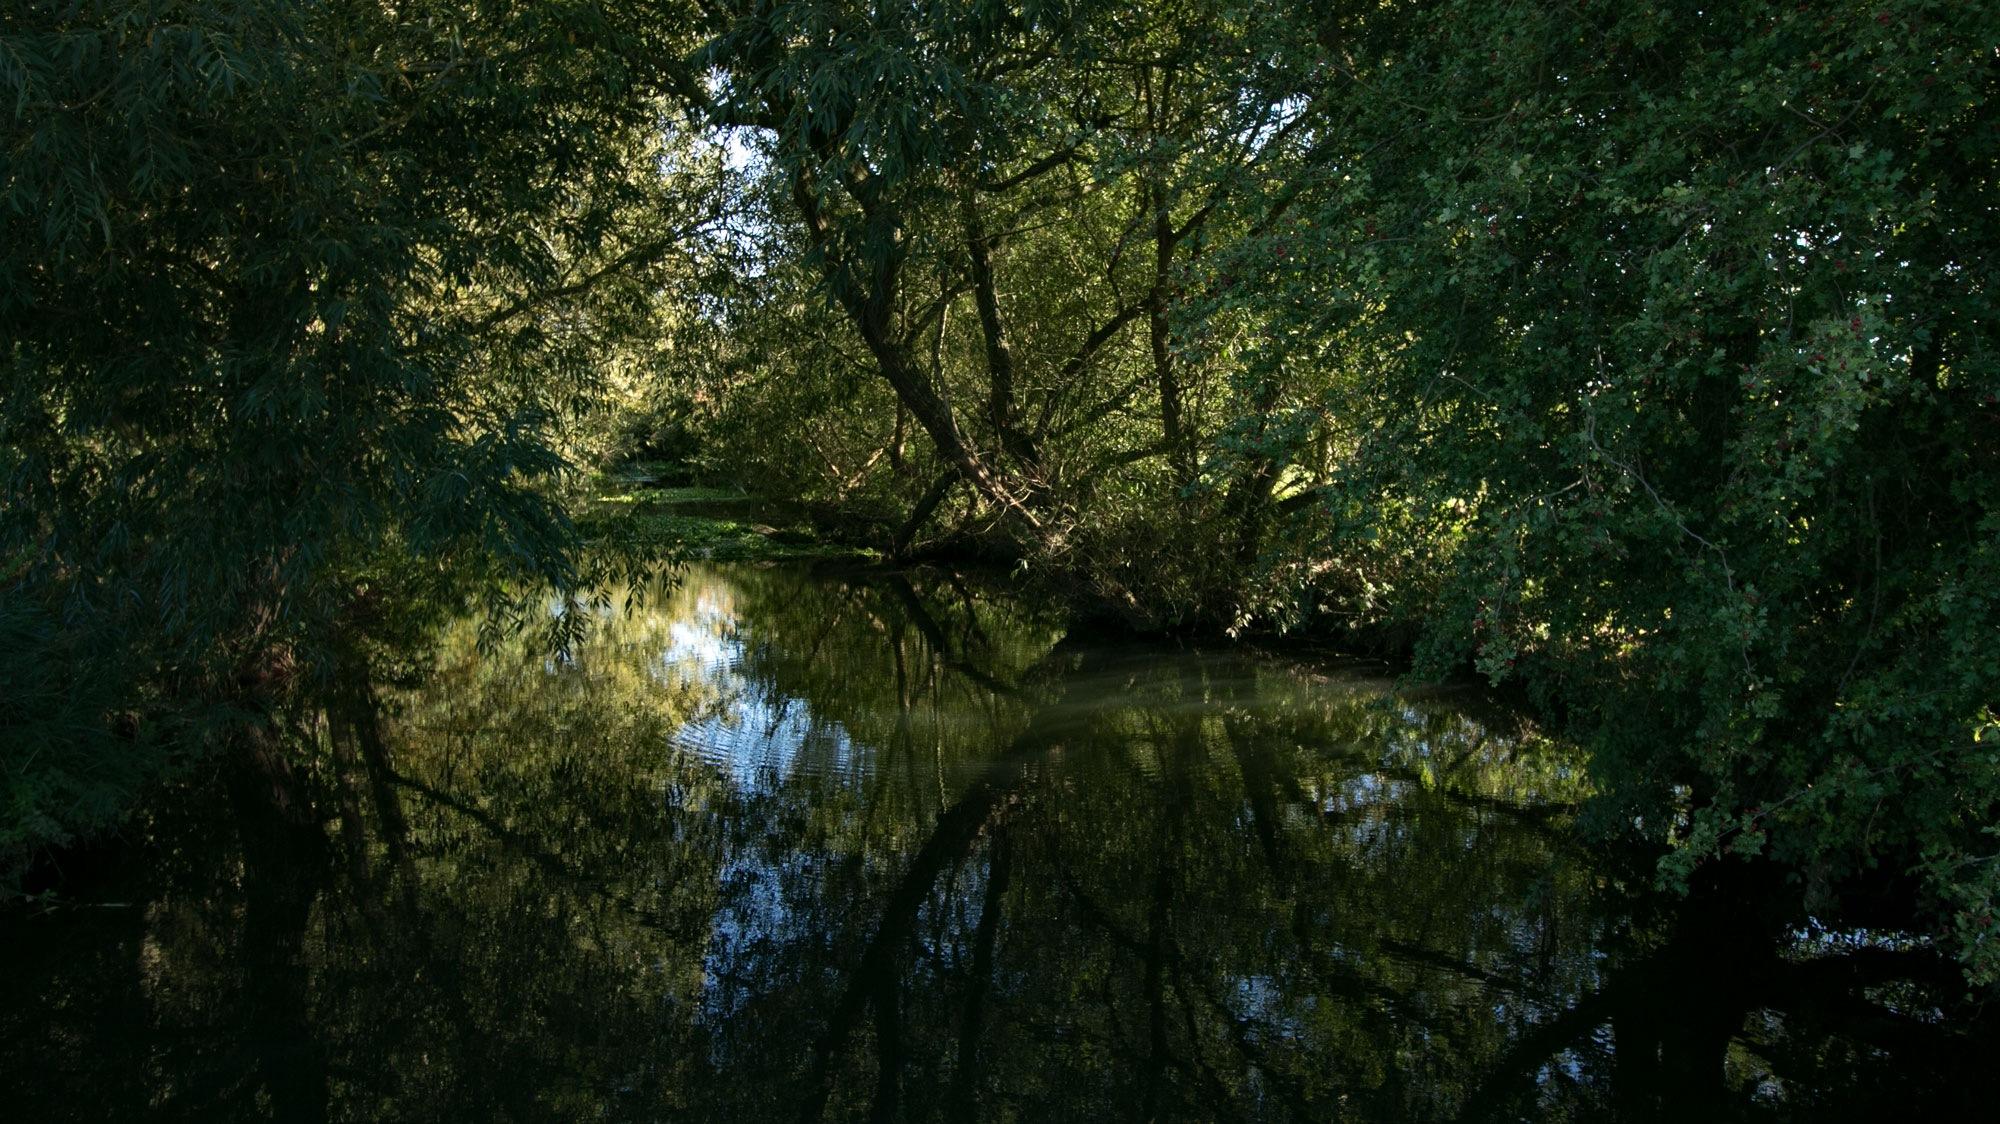 River View by Karen